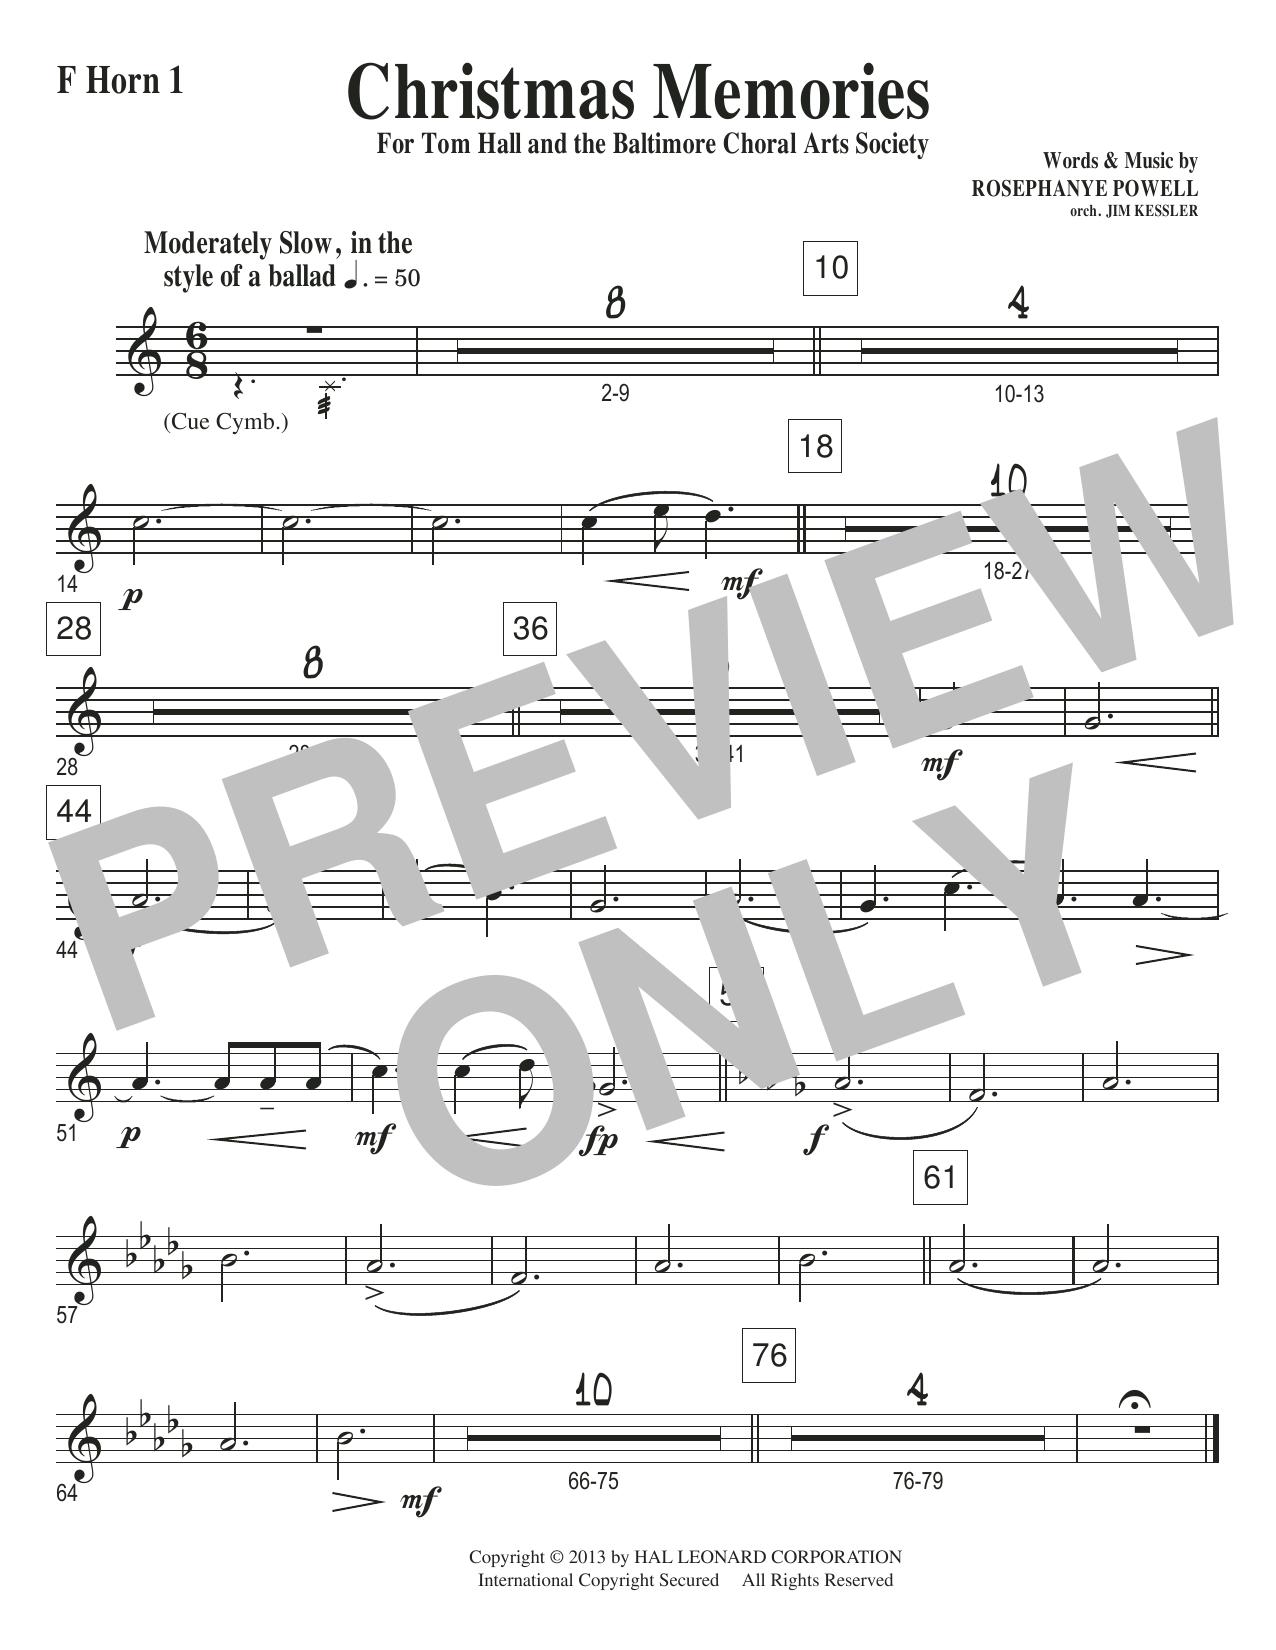 Christmas Memories - F Horn 1 Sheet Music